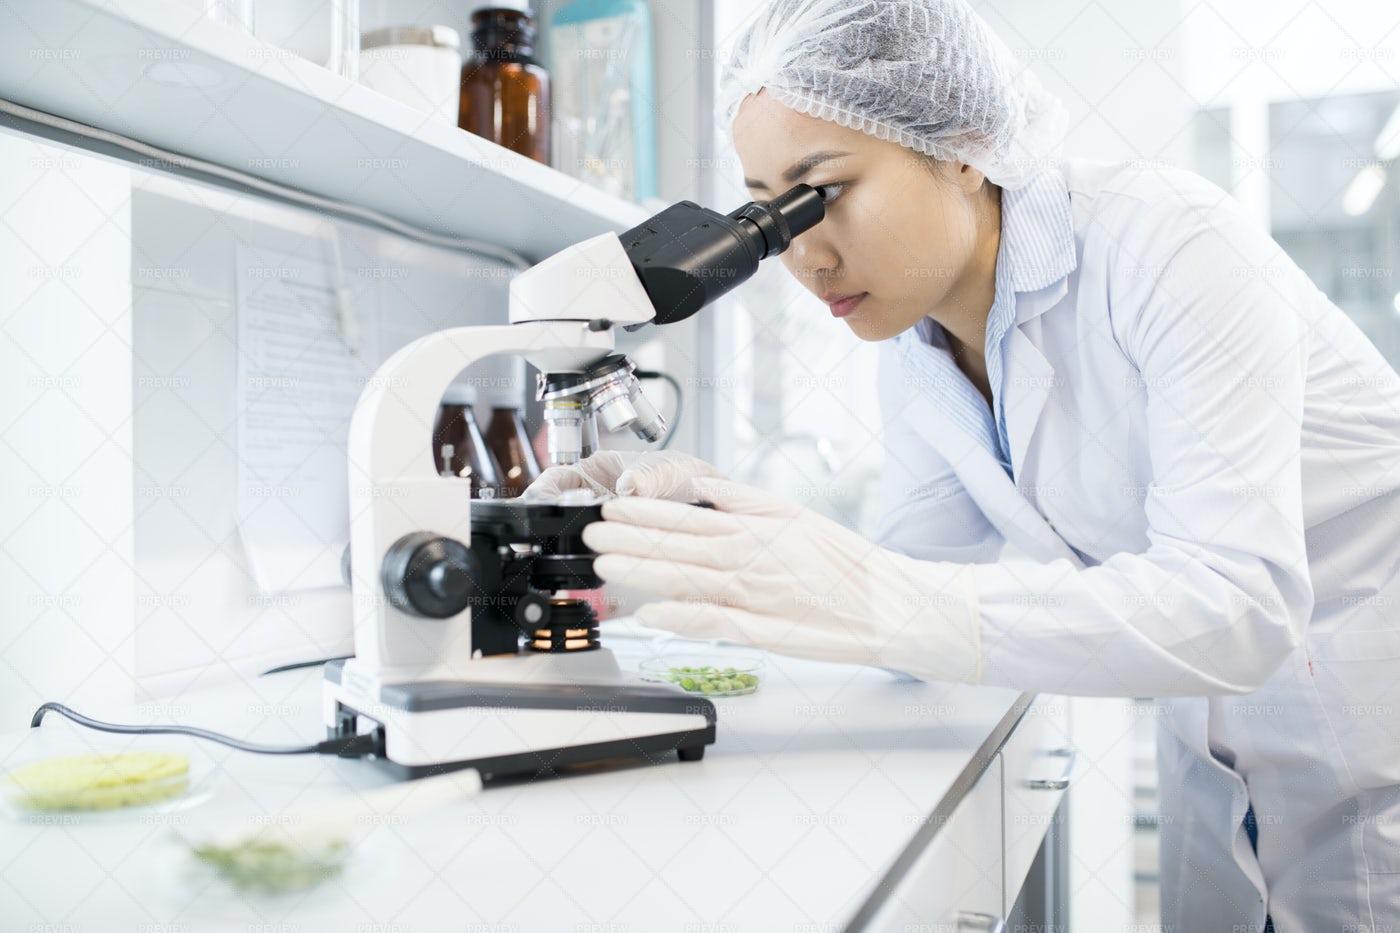 Asian Female Scientist Using...: Stock Photos